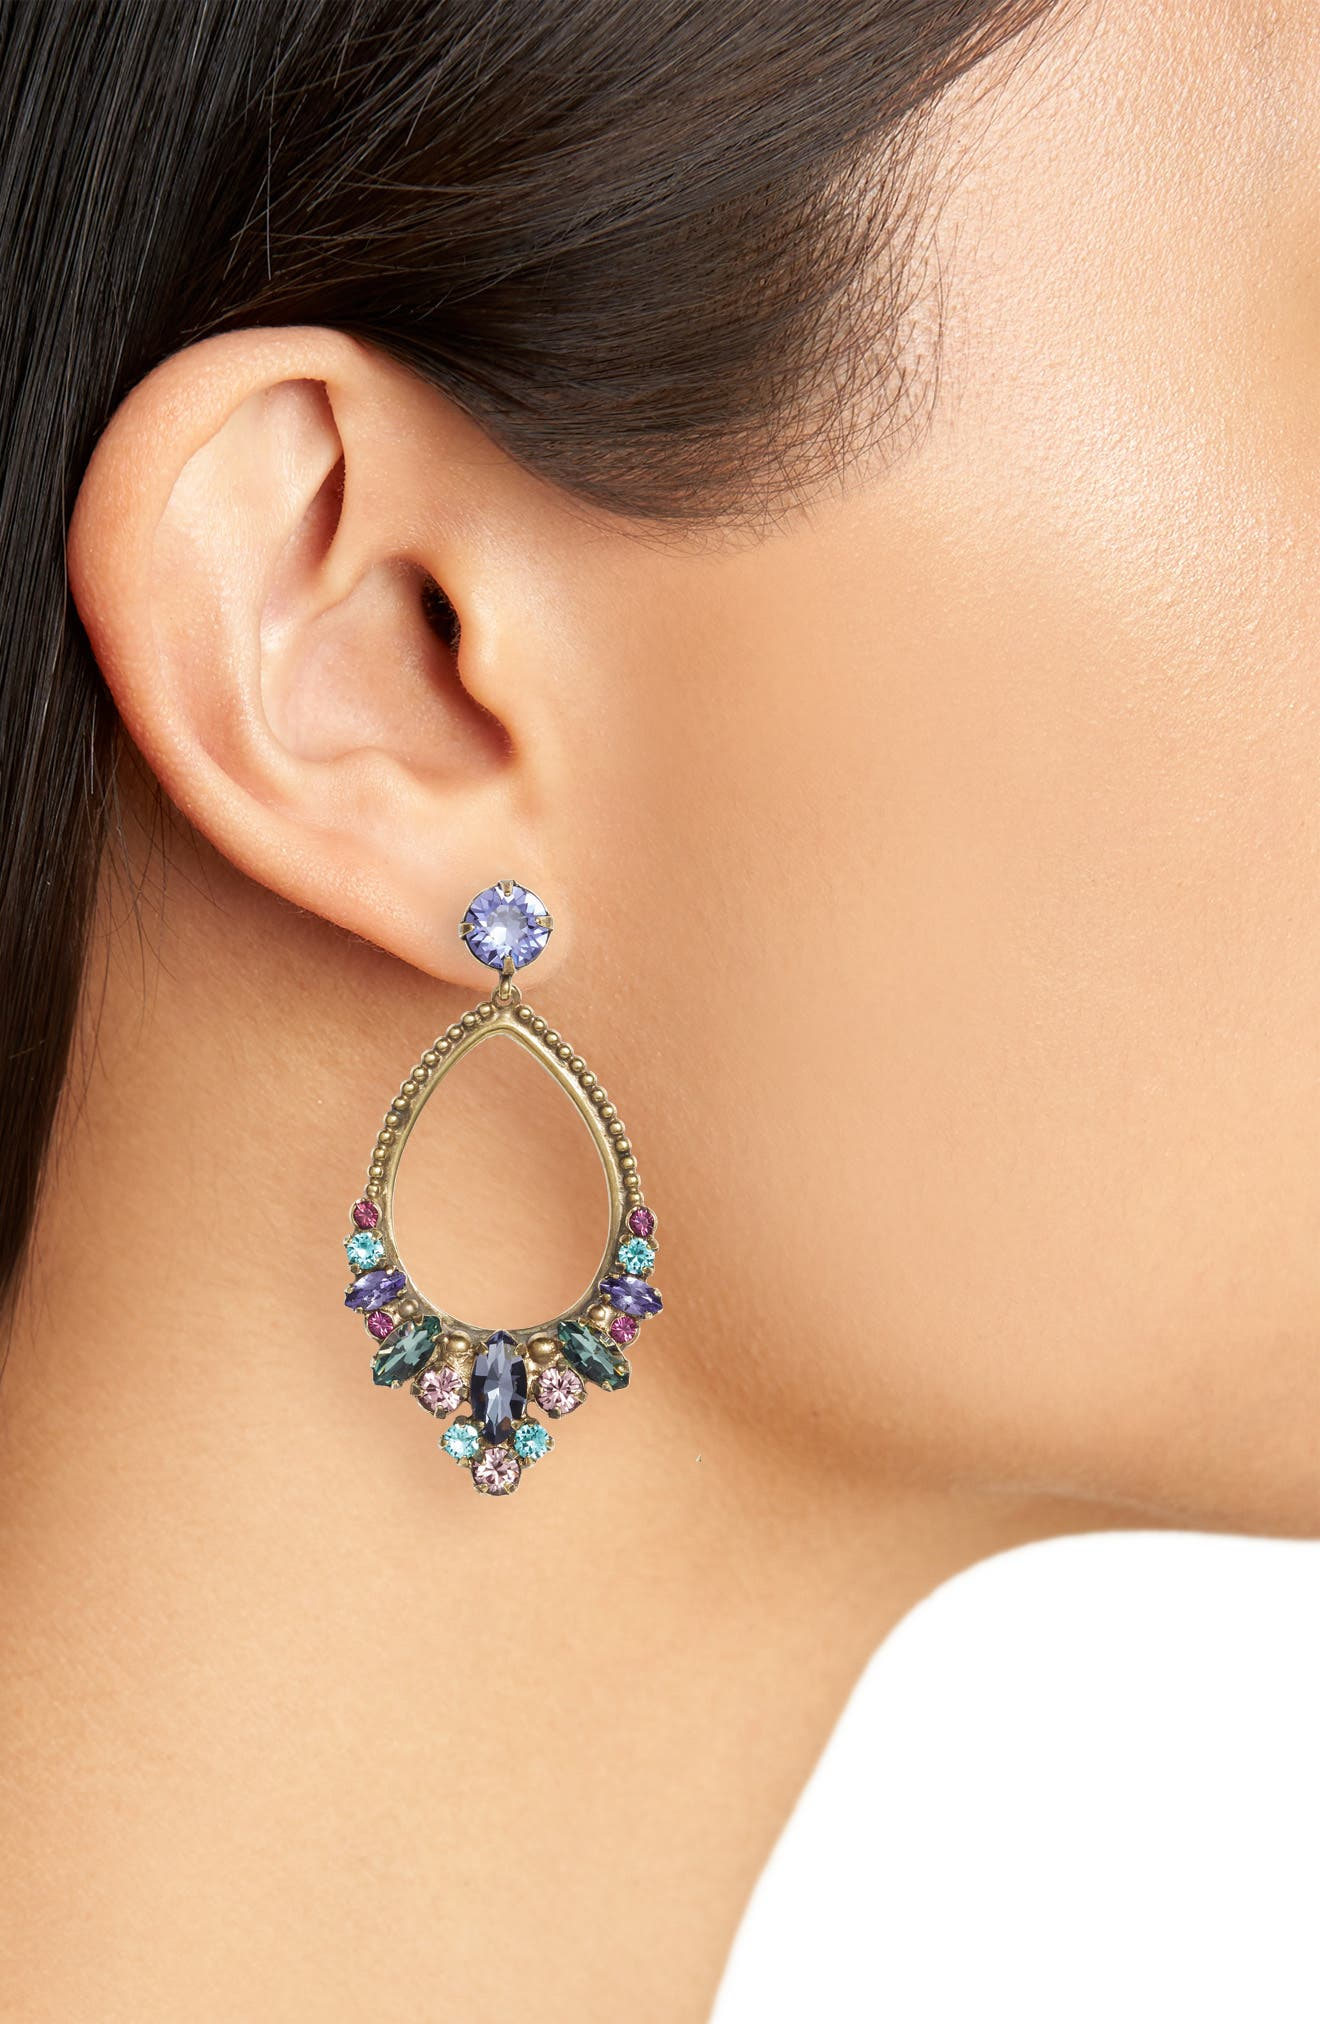 Noveau Navette Crystal Drop Earrings,                             Alternate thumbnail 2, color,                             Multi